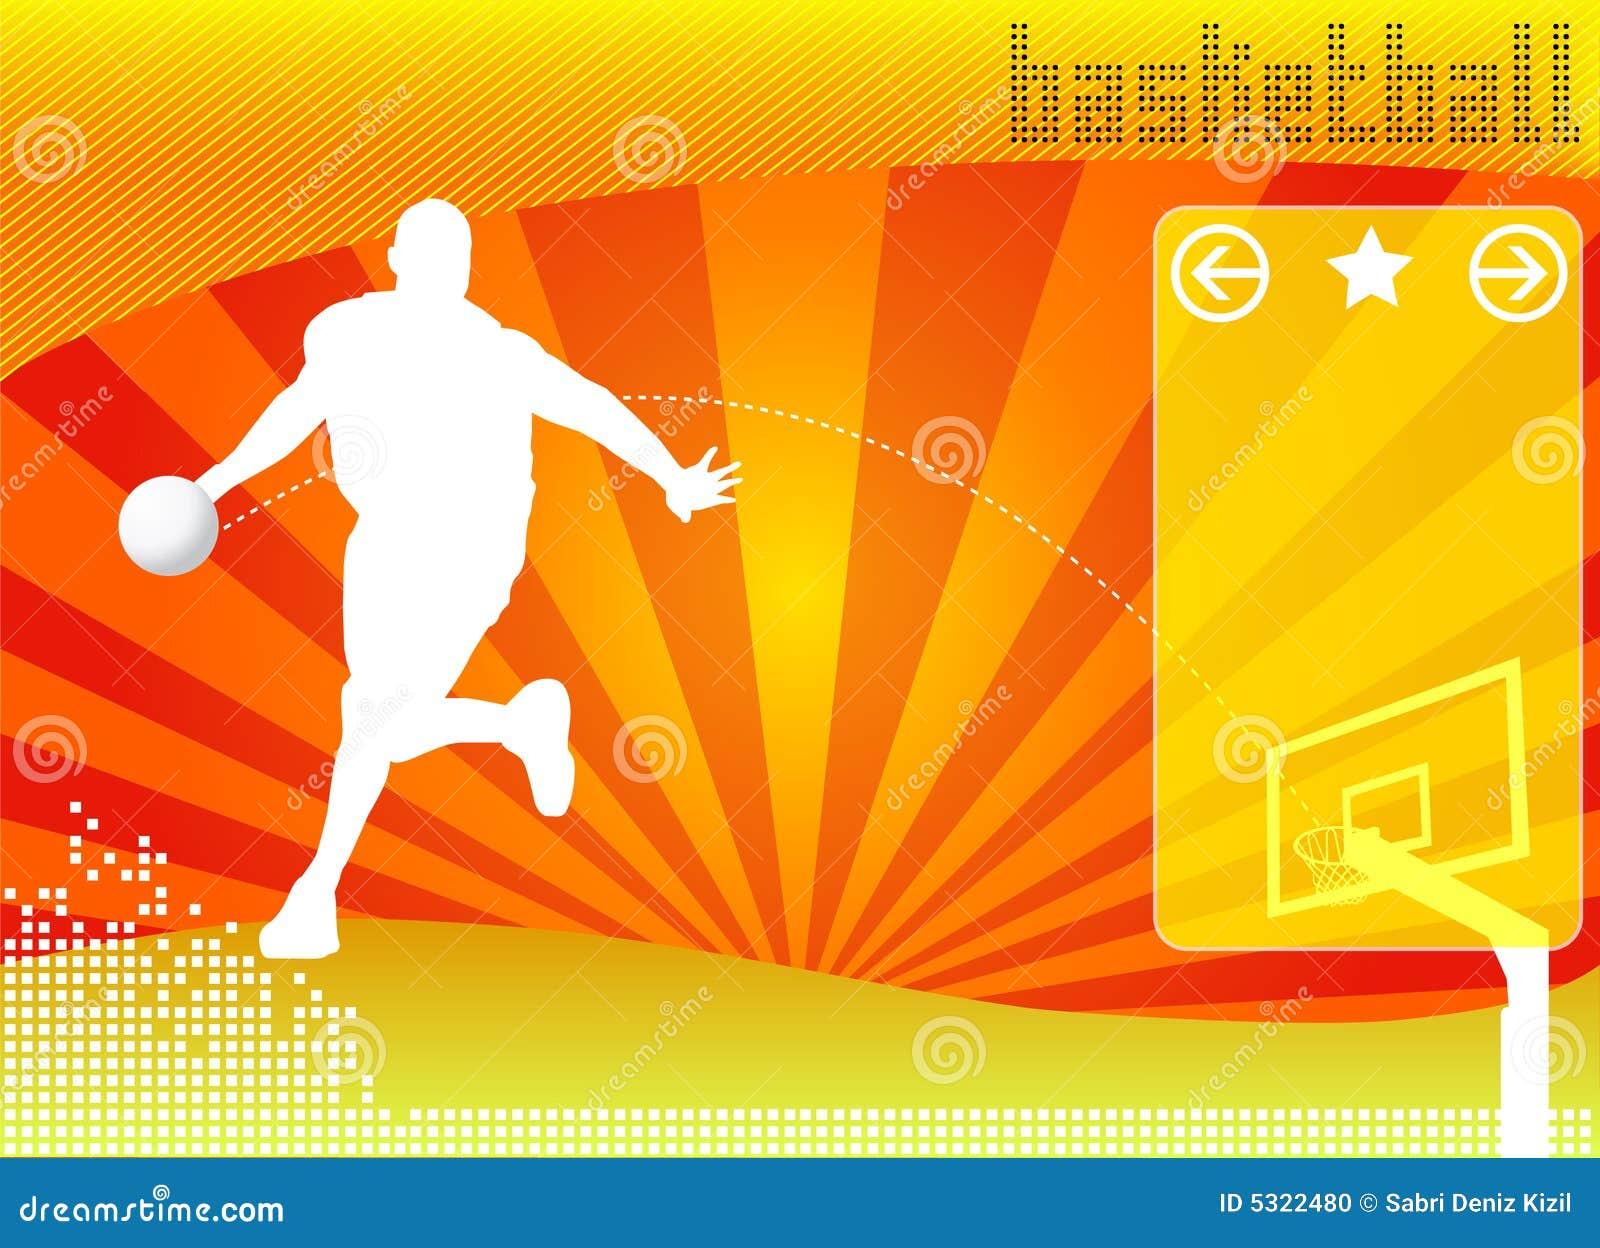 Basketball concept background vector